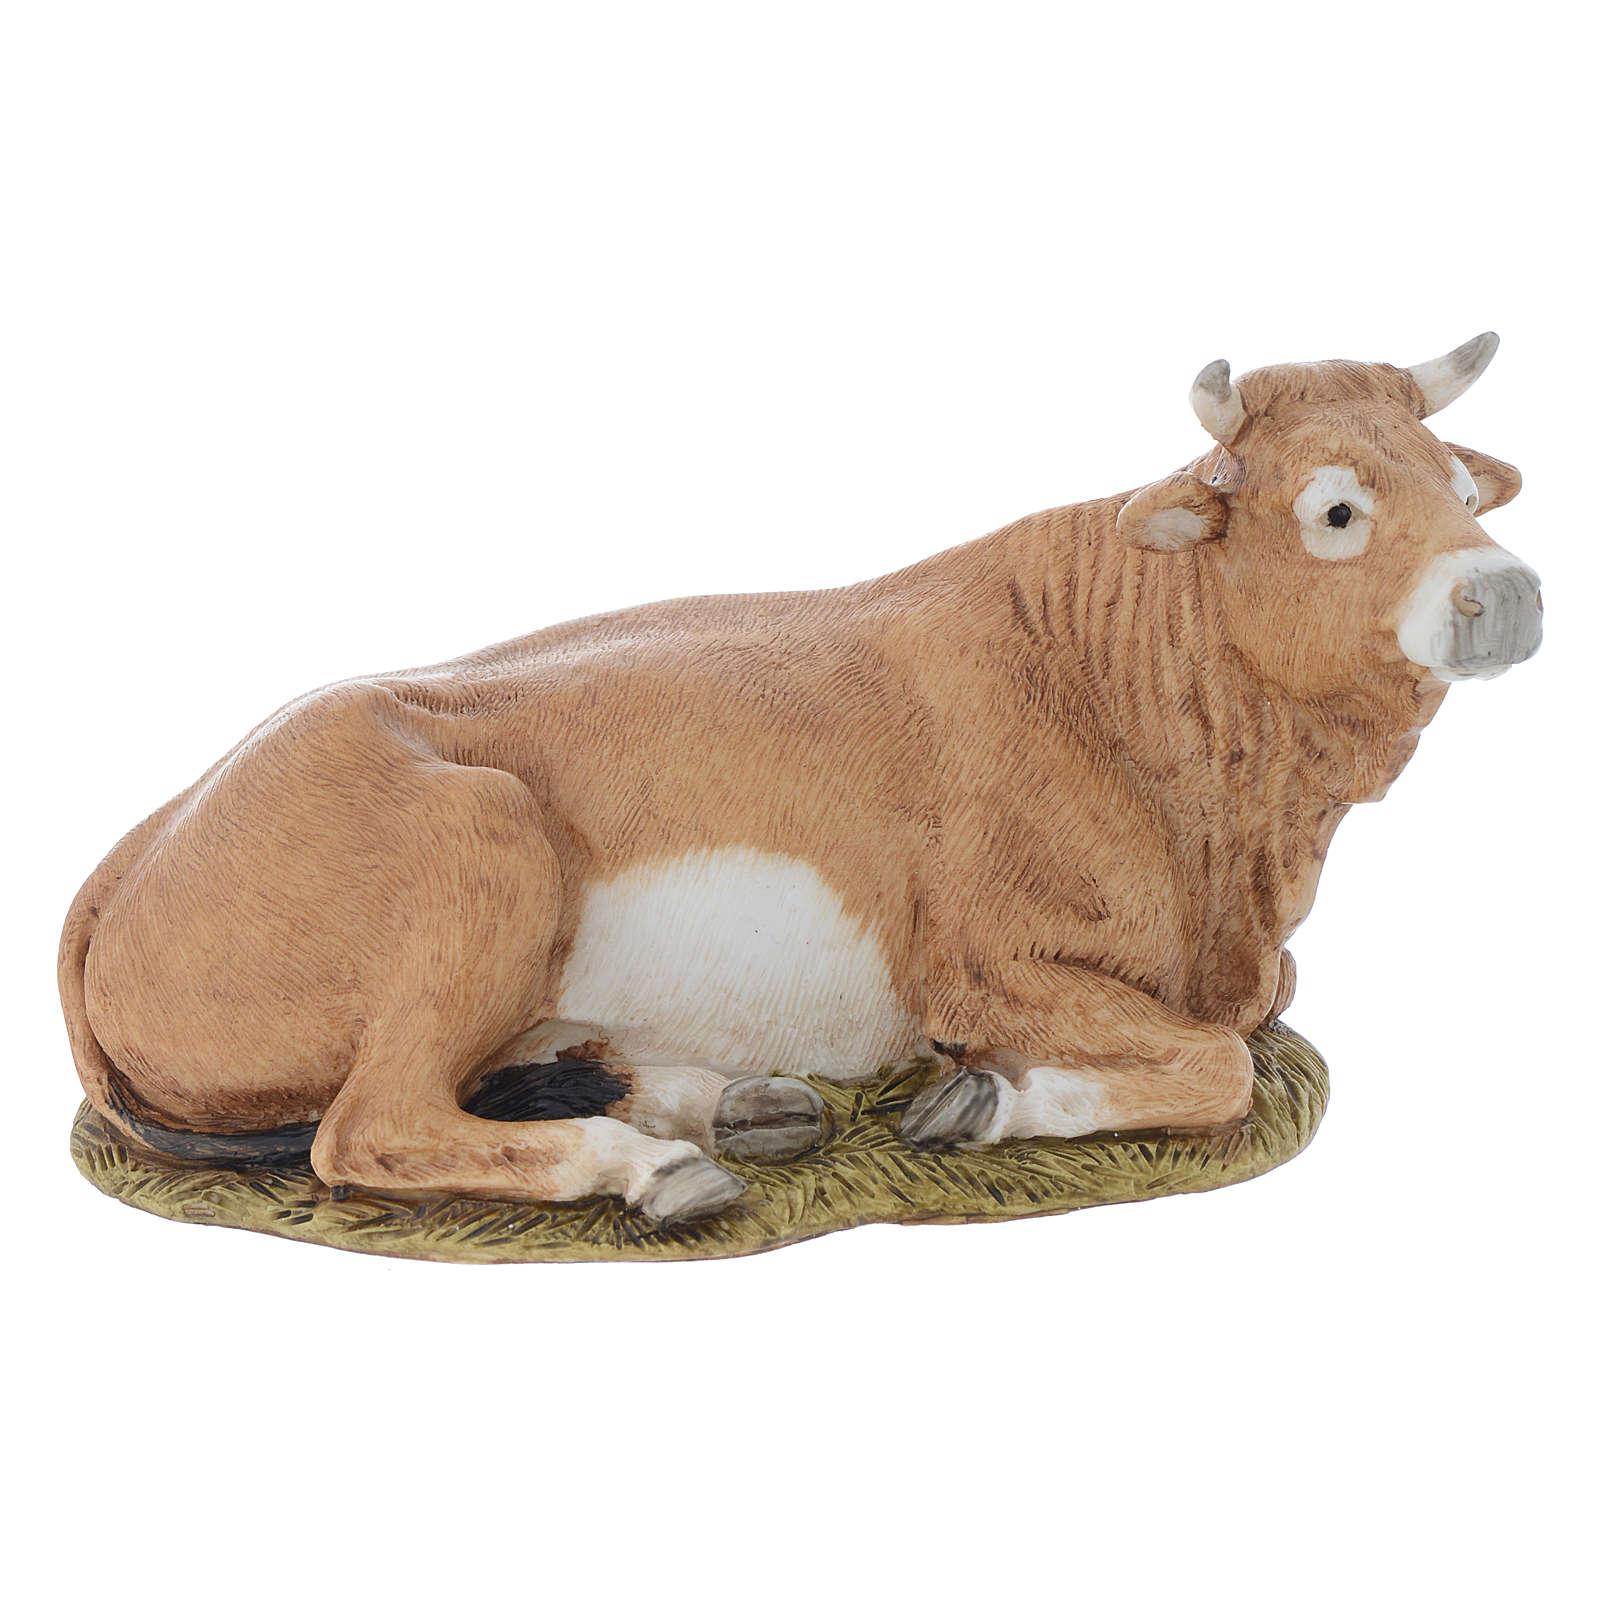 Nativity scene figurine, ox, 11cm by Landi 3